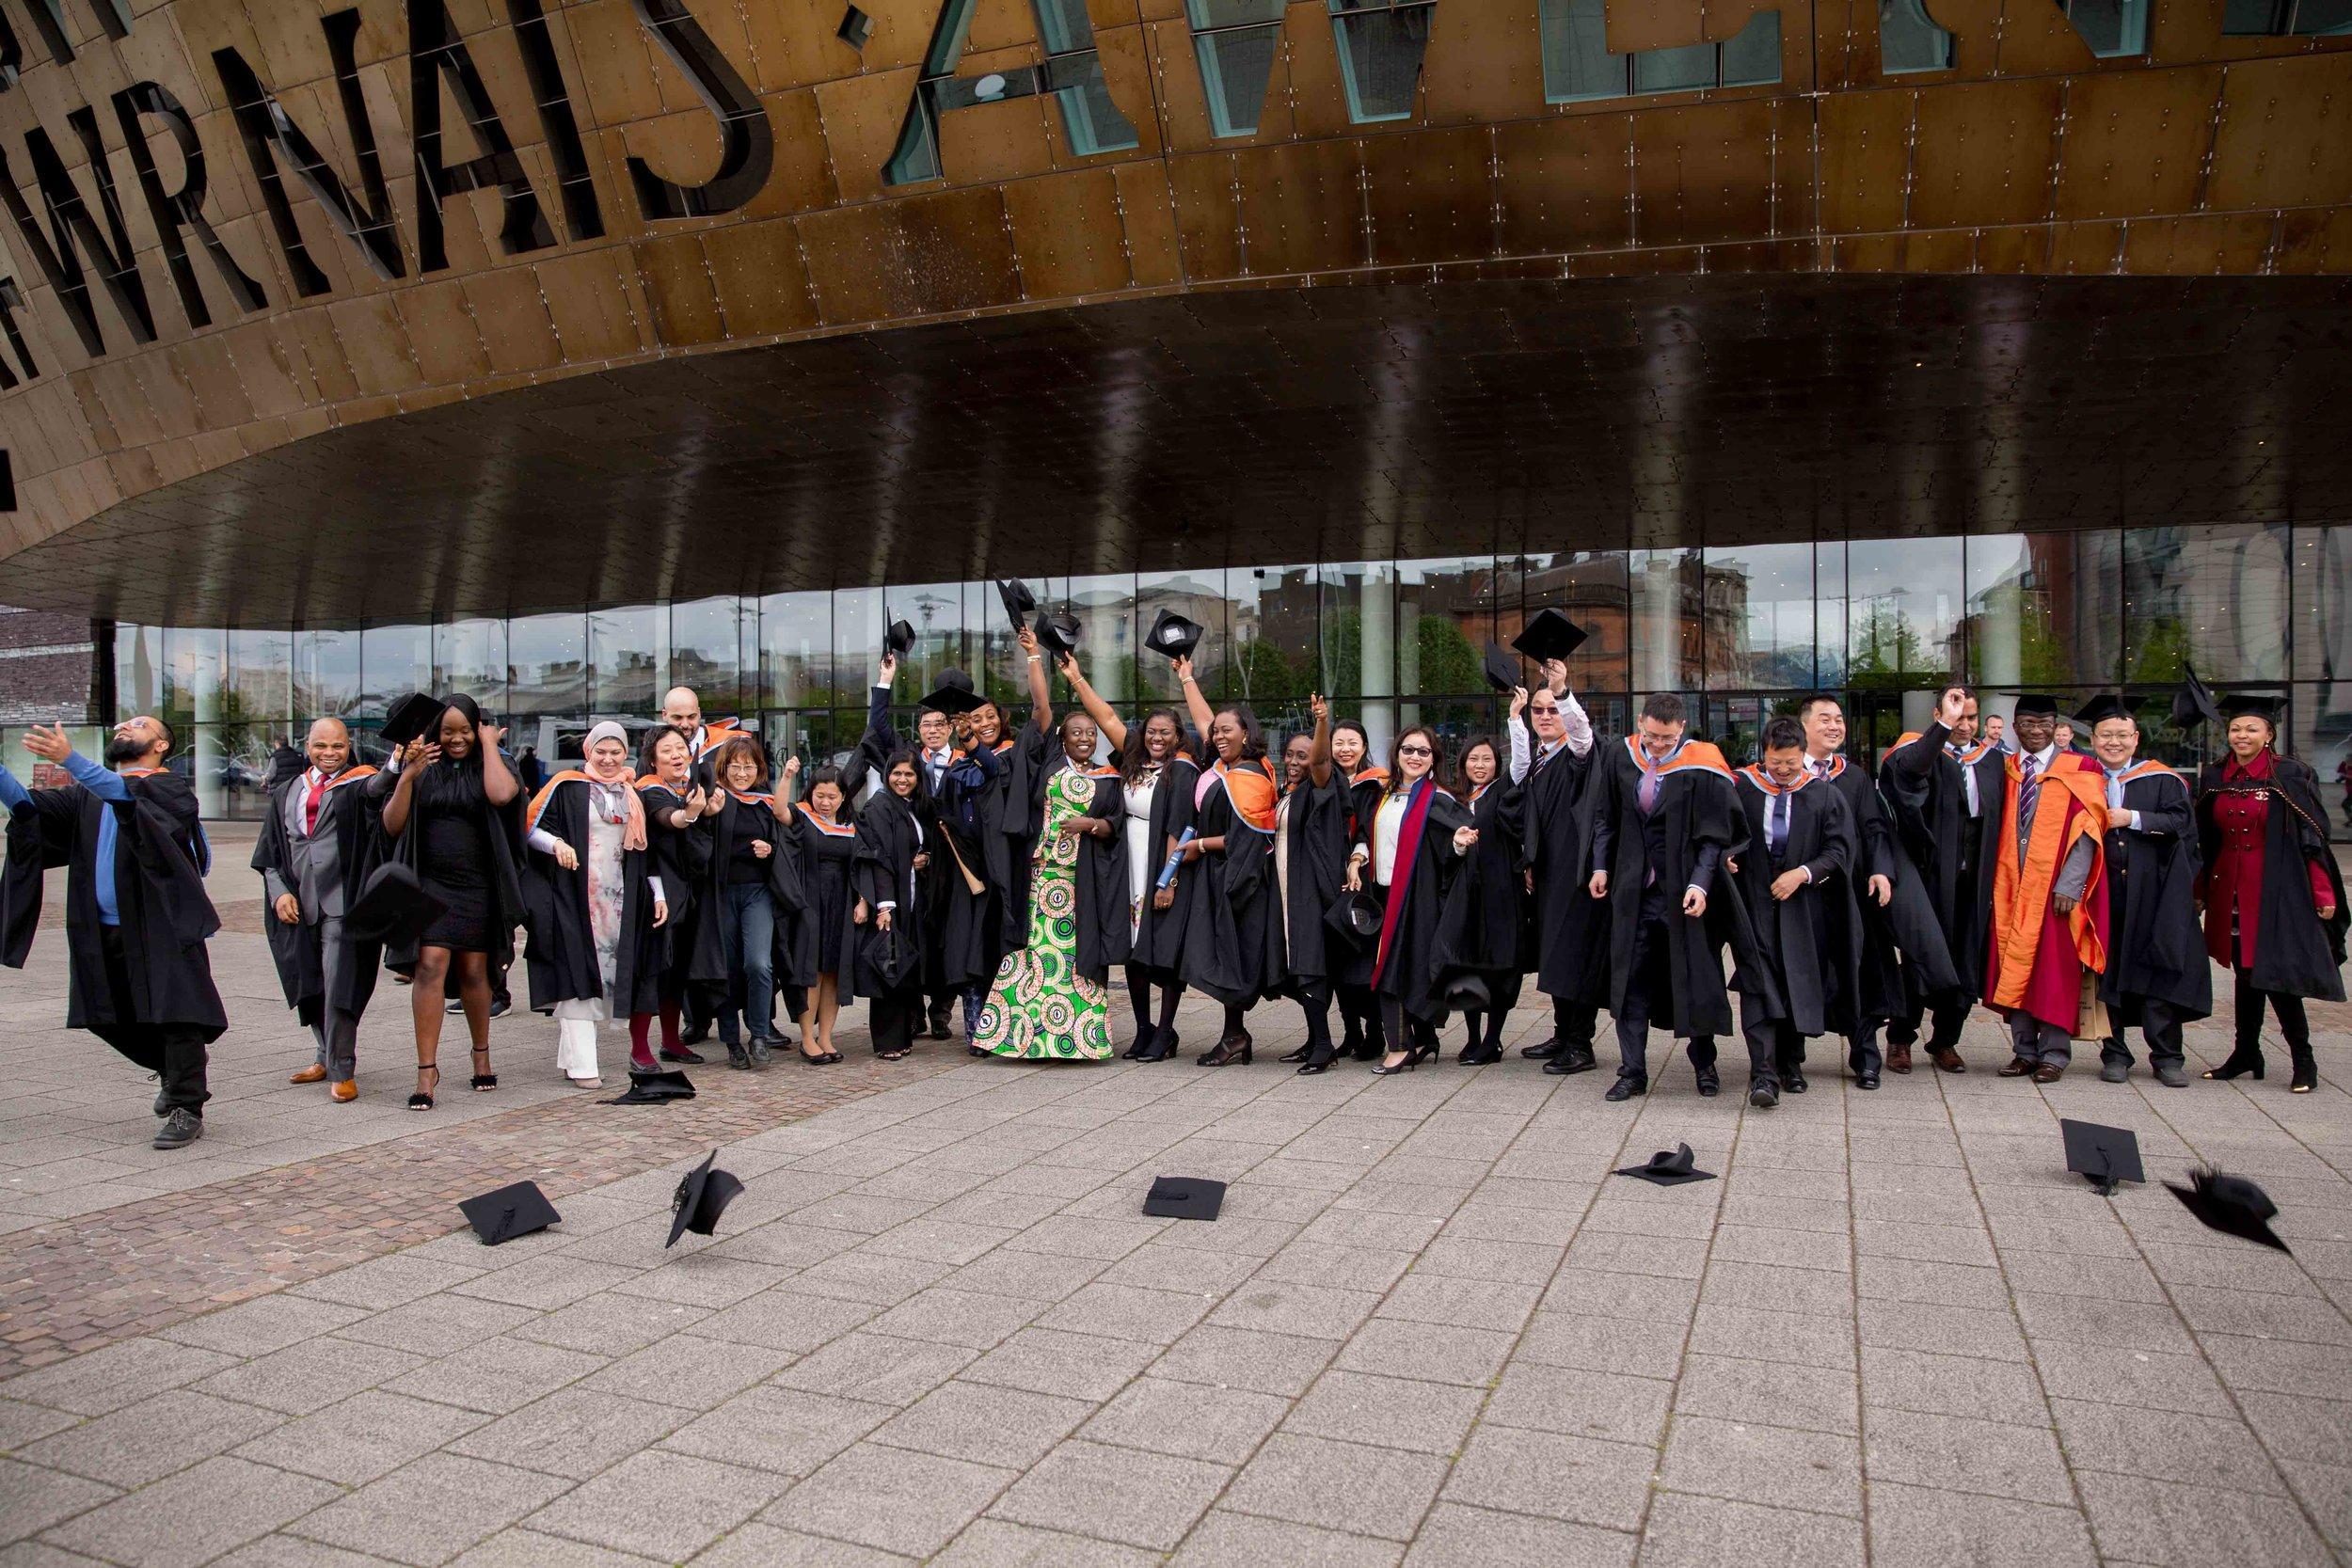 Arden-university-graduation-commercial-photographer-cardiff-natalia-smith-photography-33.jpg